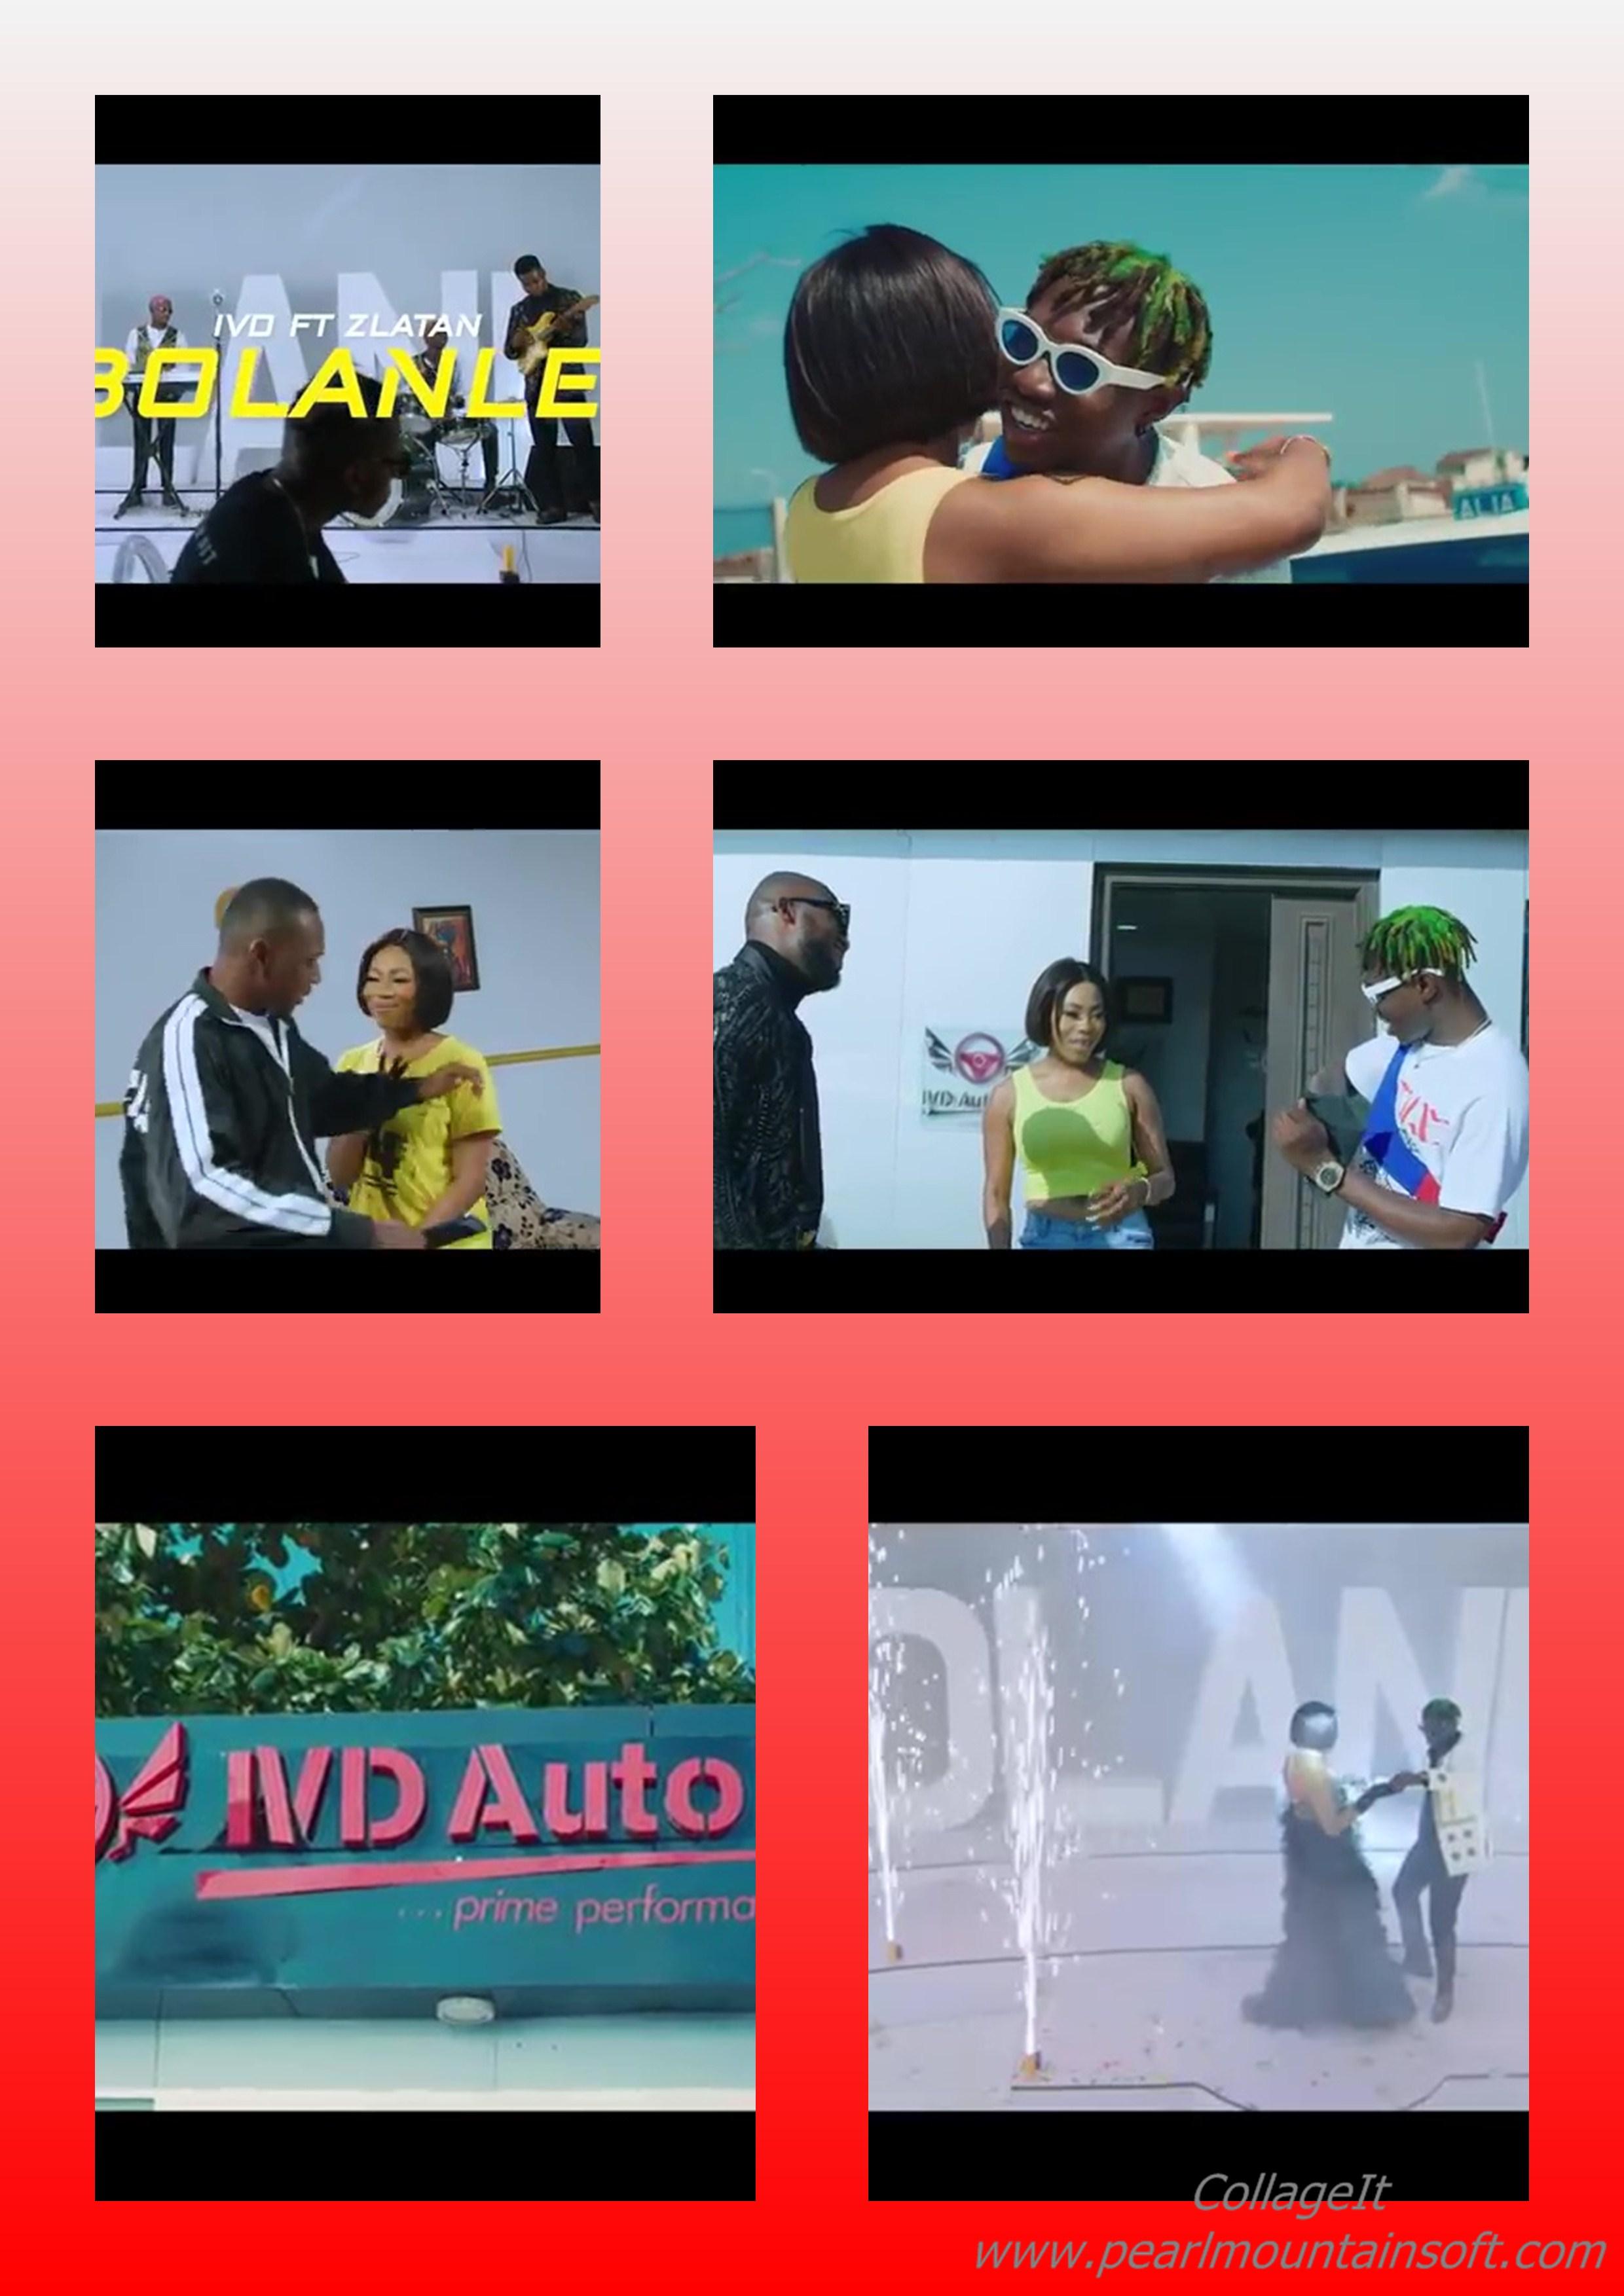 "(+LYRICS+MUSIC+TRANSLATIONON) MUSIC REVIEW: BOLANLE BY IVD FT ZLATAN ""ON REPEAT!"""